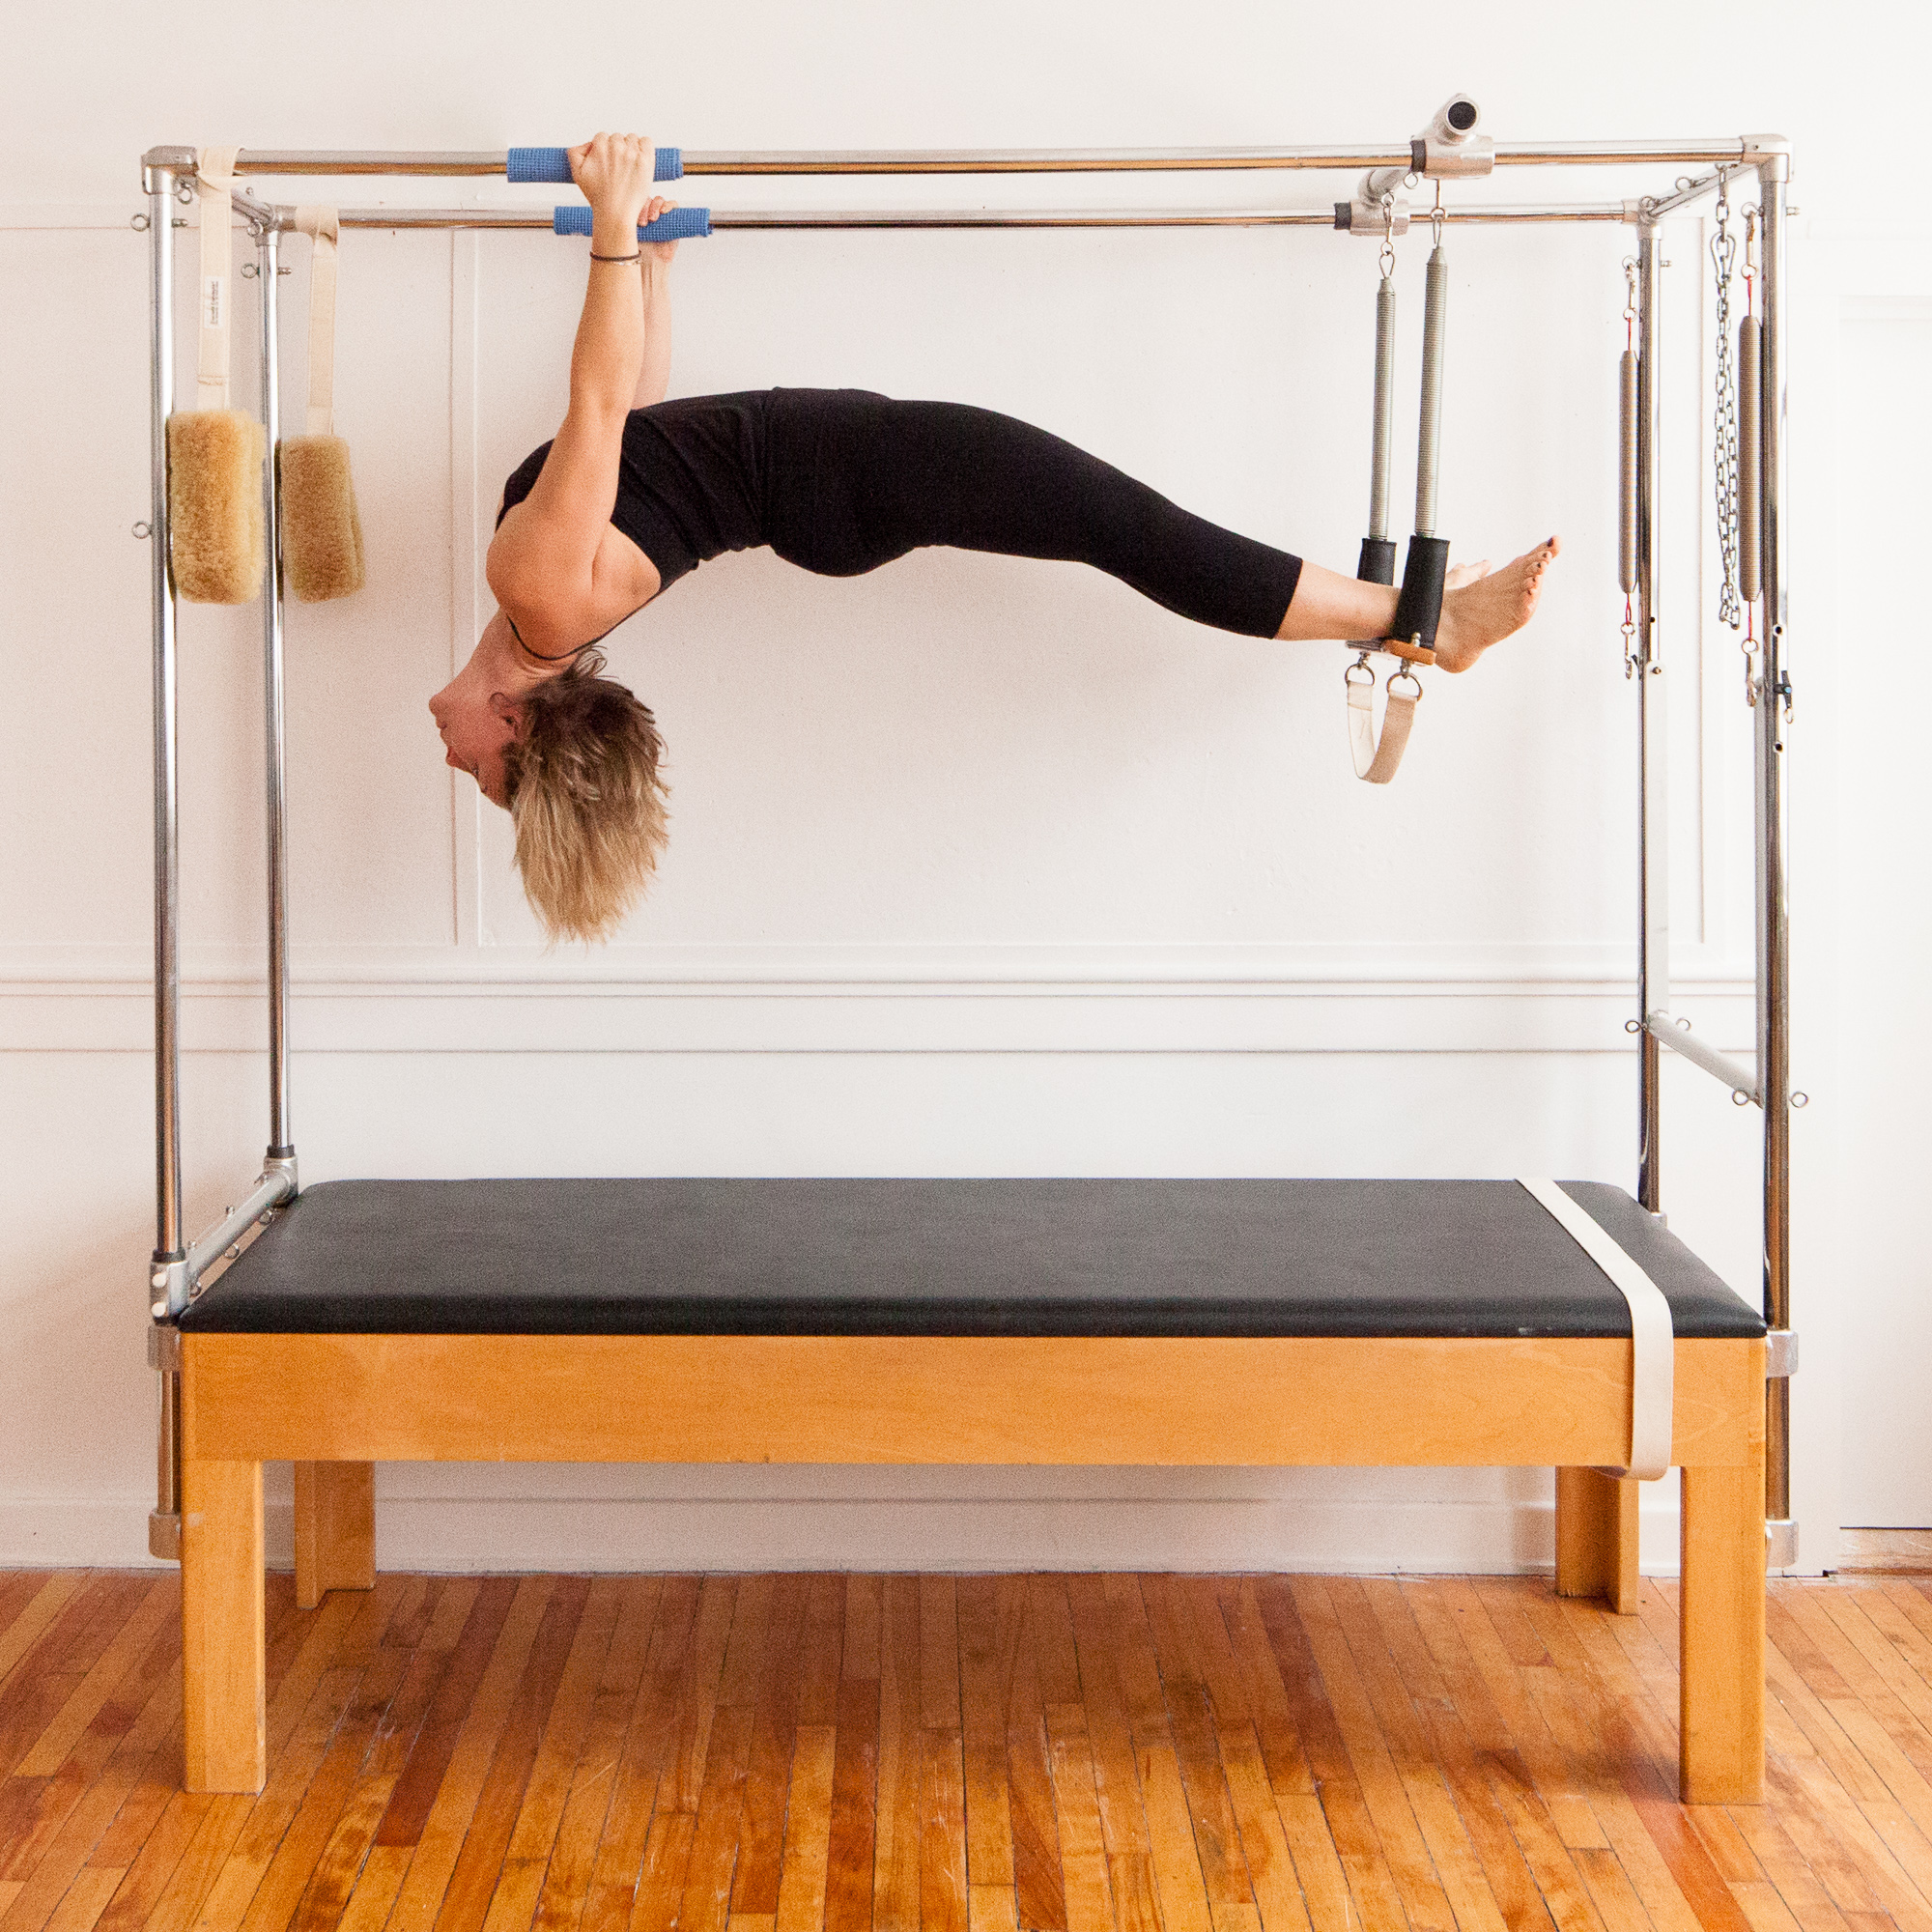 Hanging Pull-Ups - 2